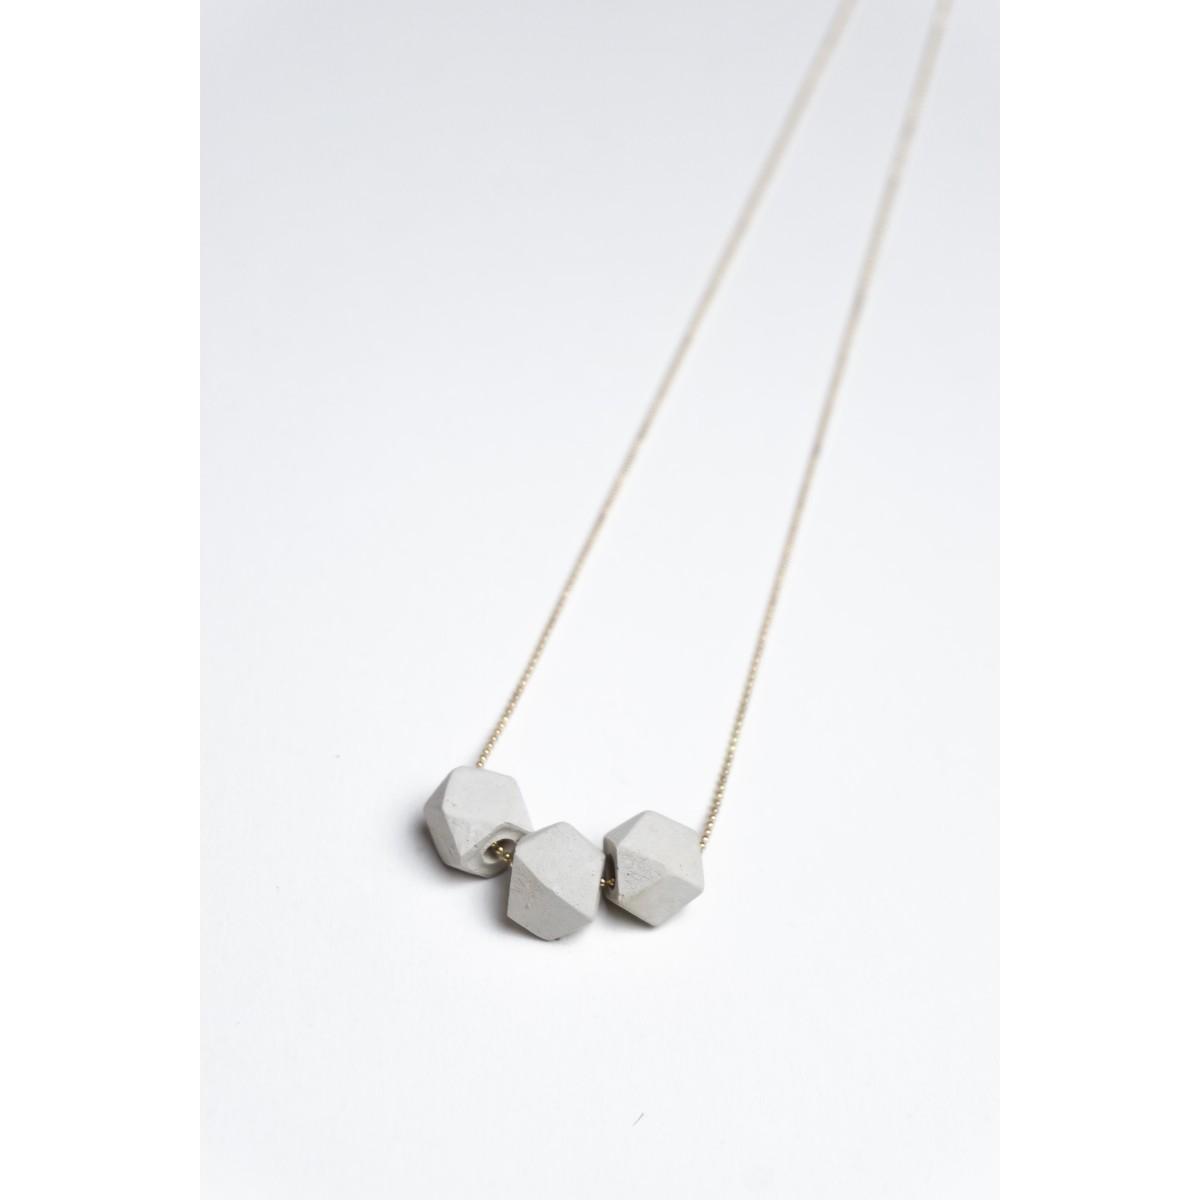 Klunkergrau Betonschmuck | 3x Geometrische Perle aus Beton